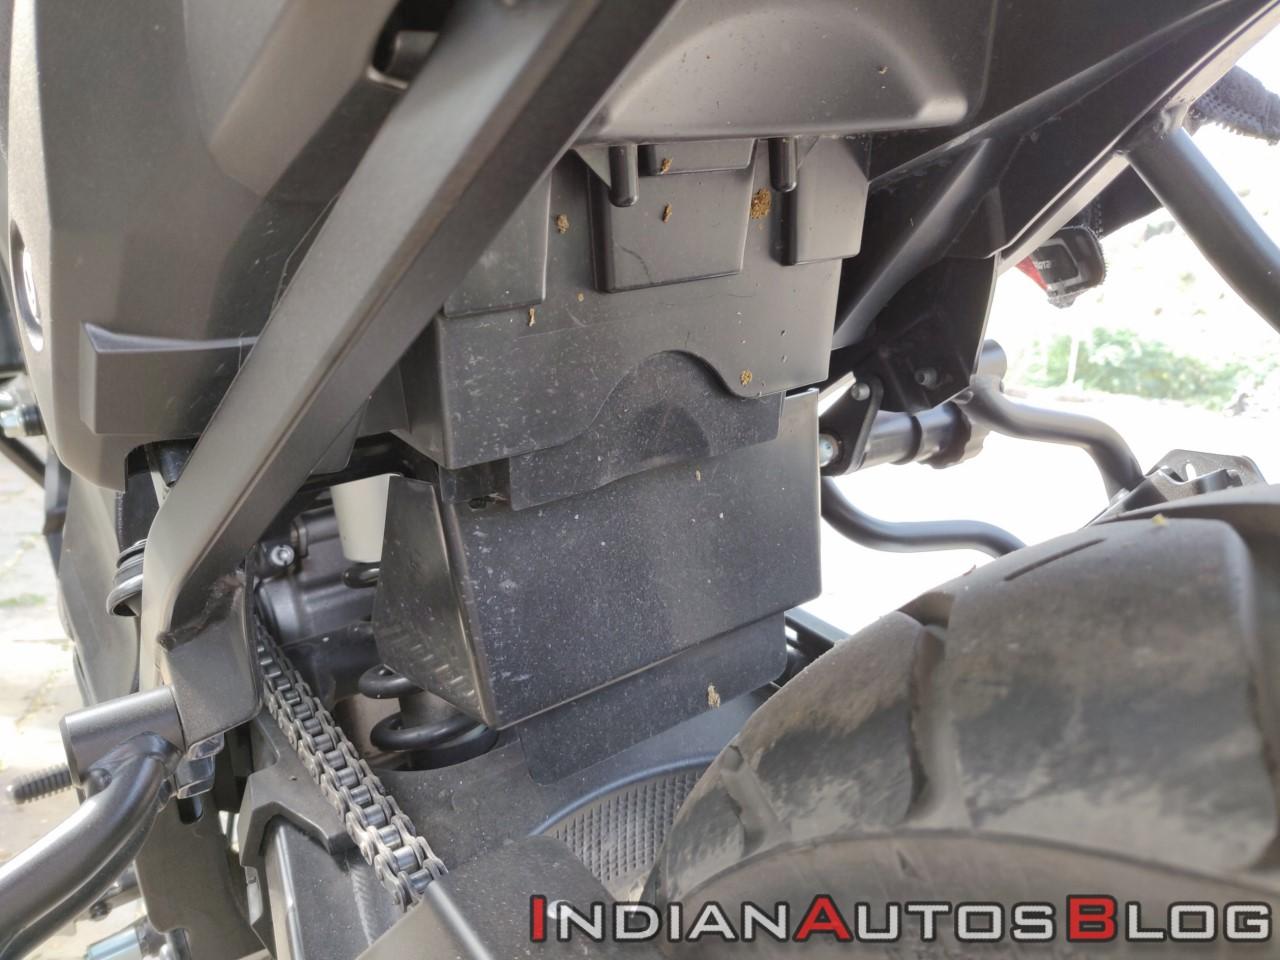 Suzuki V Strom 650 Xt Details Rear Suspension Cove